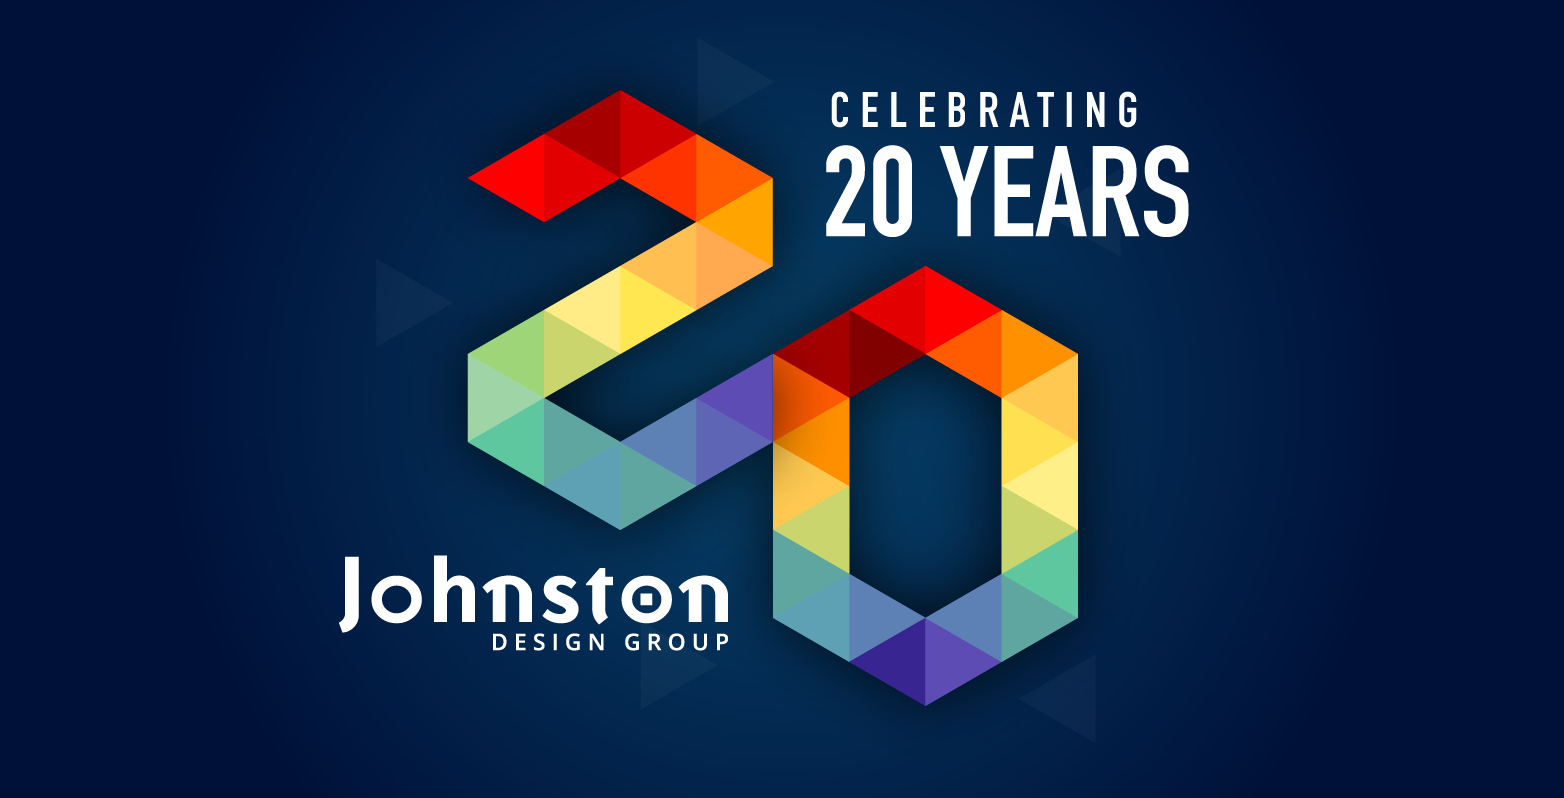 Johnston Design Group turns 20 this year